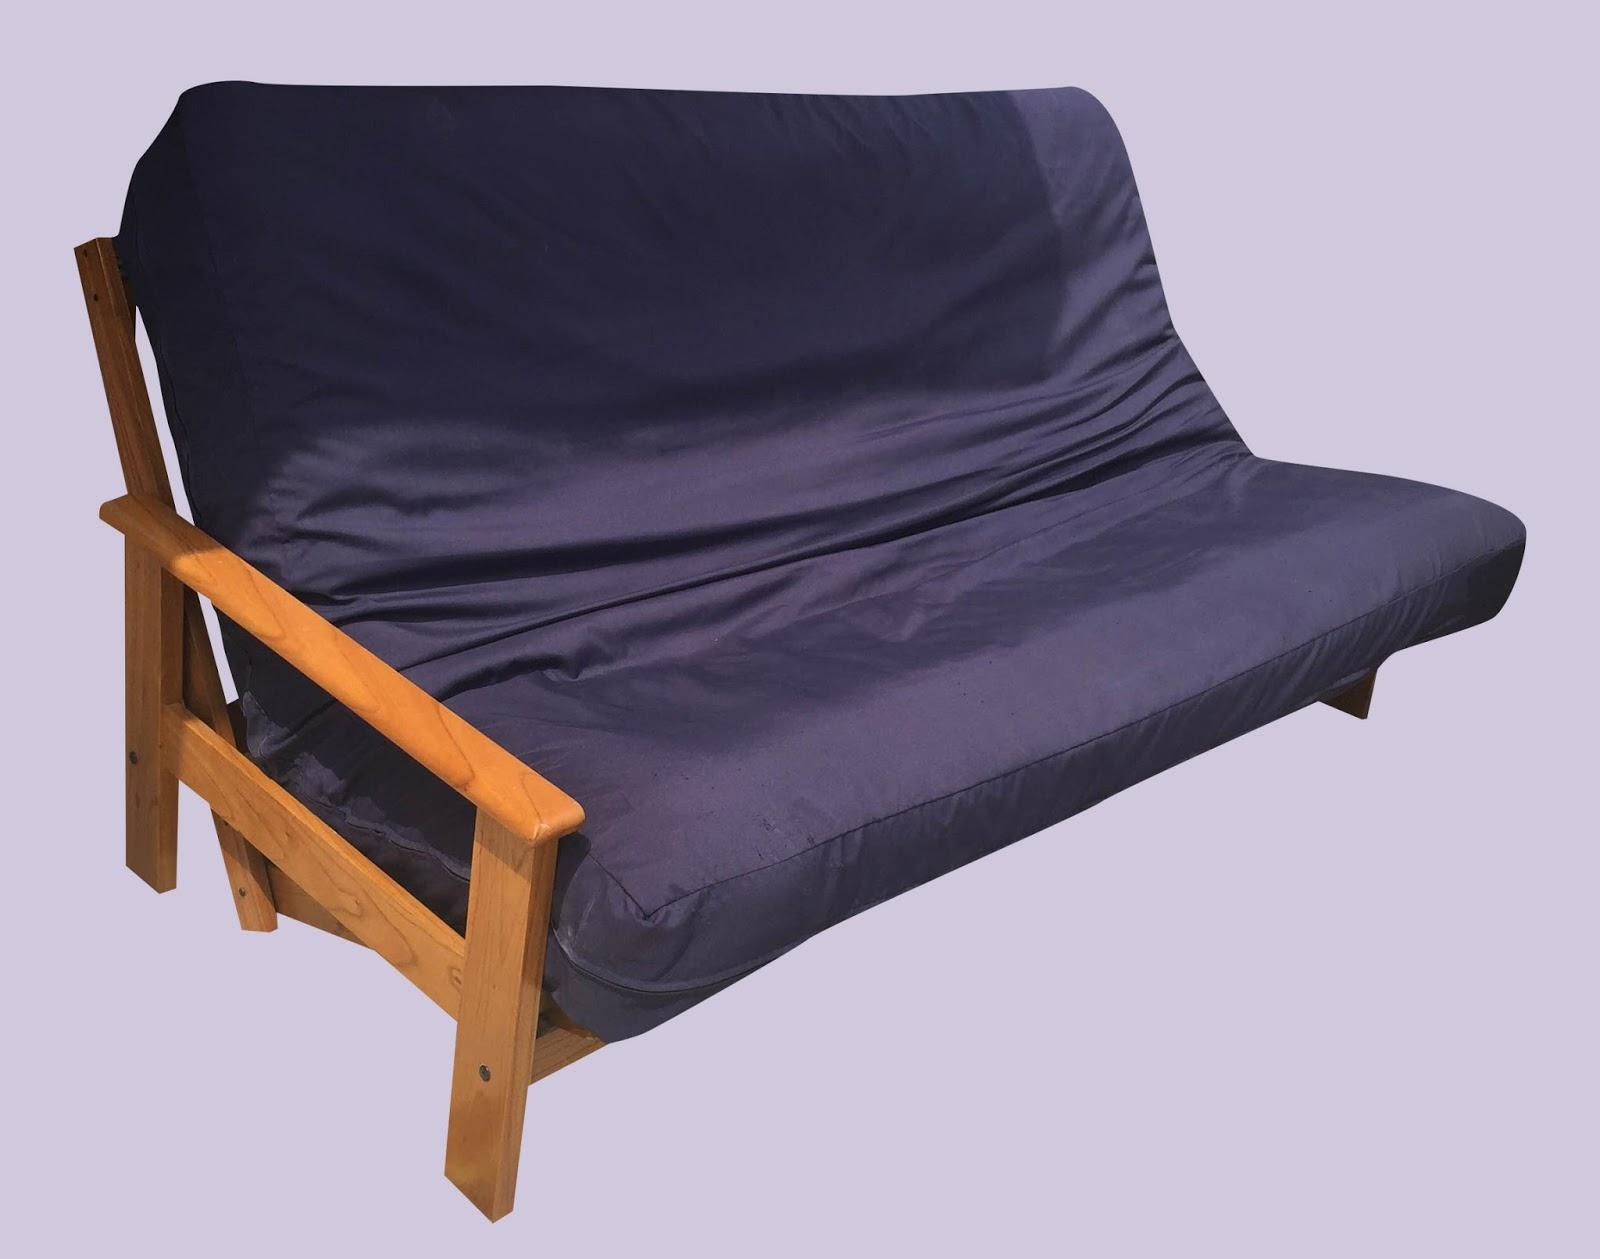 uhuru furniture collectibles wood futon frame with